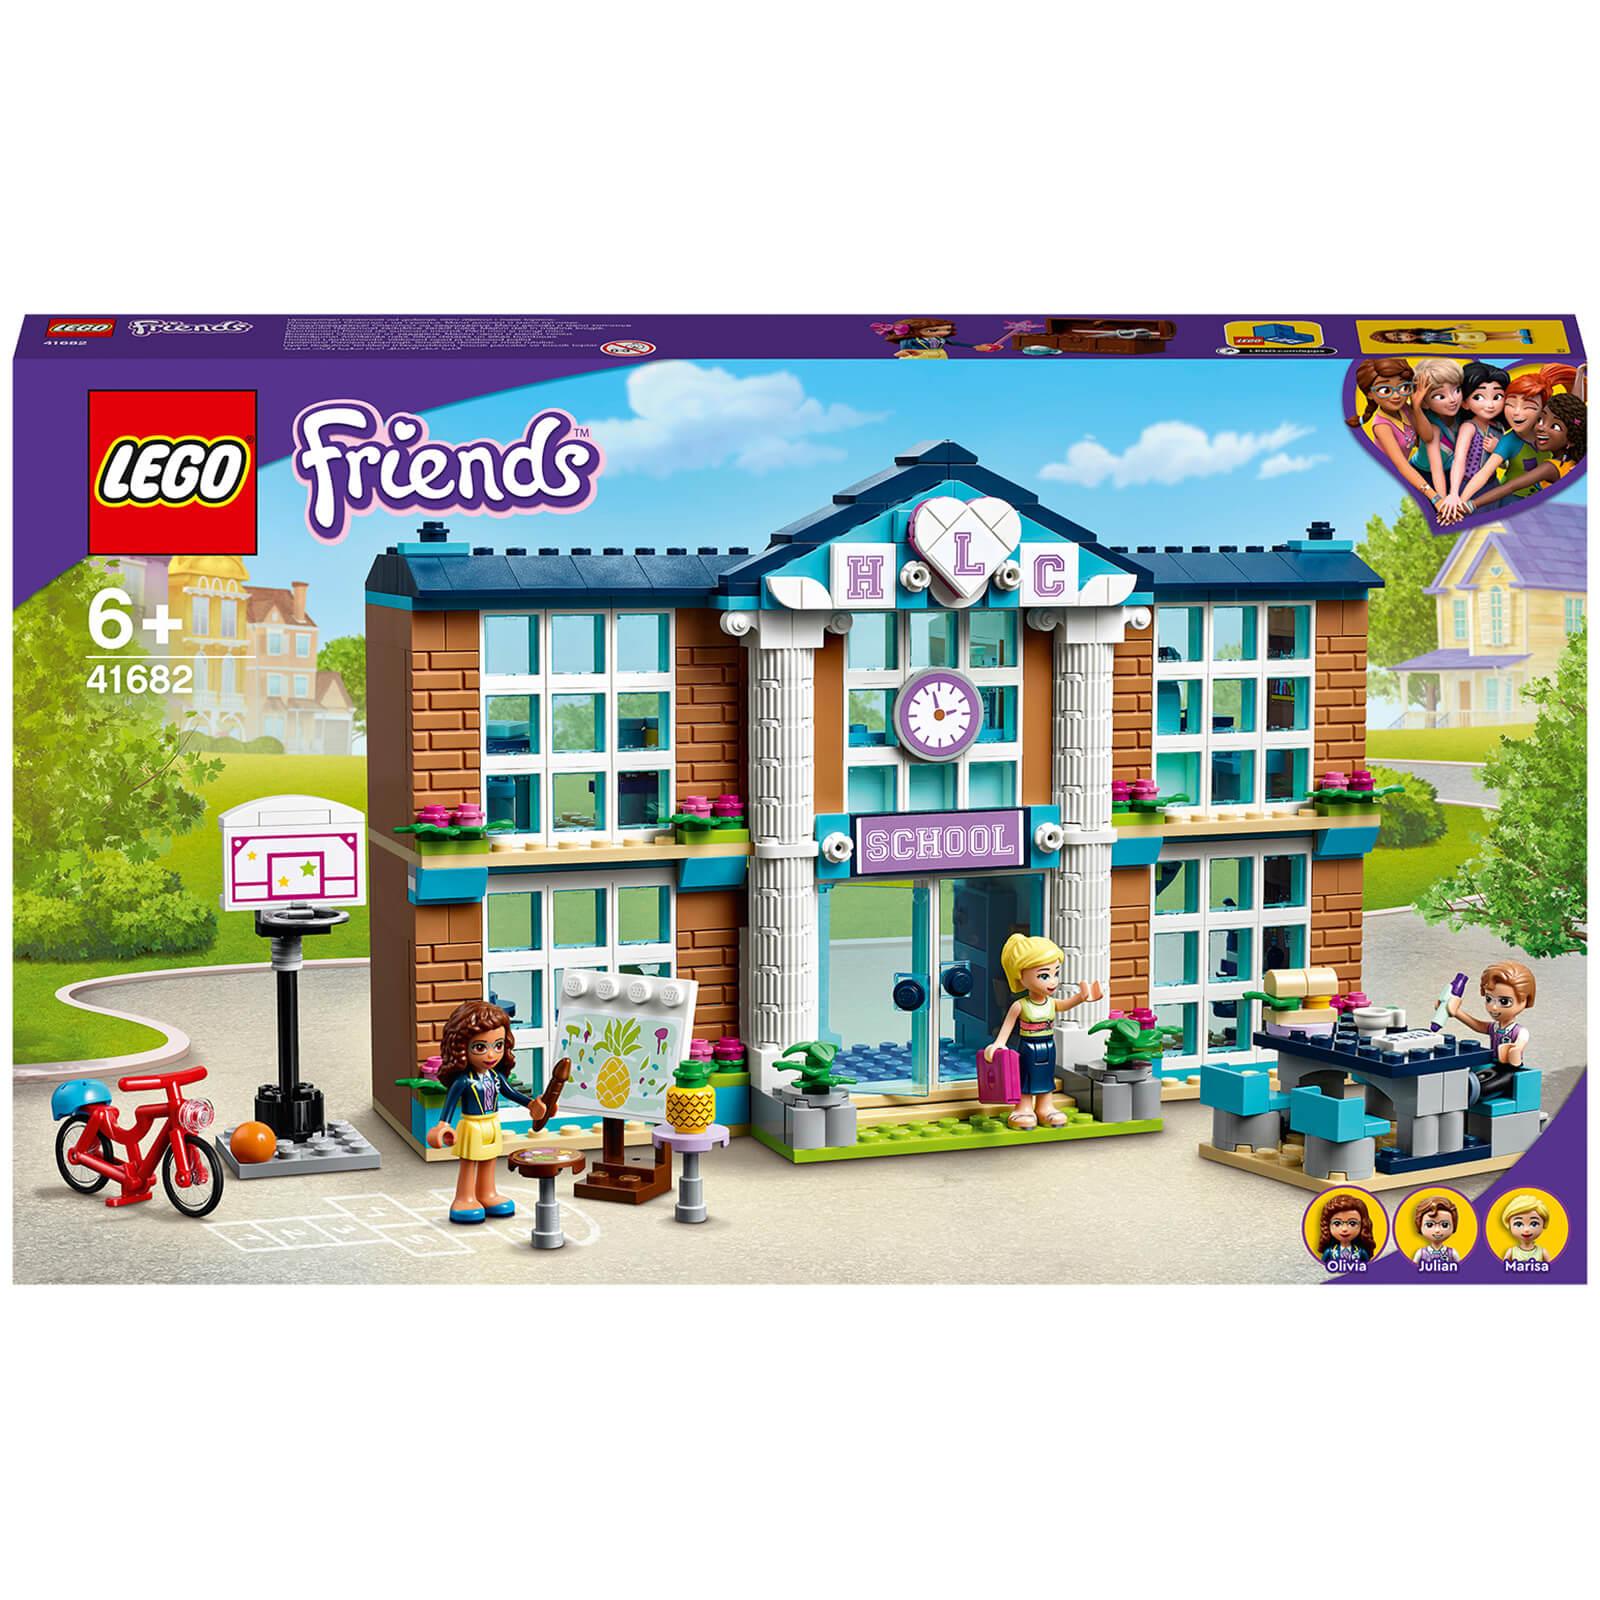 Lego Friends Heartlake City School Construction Toy (41682)-unisex